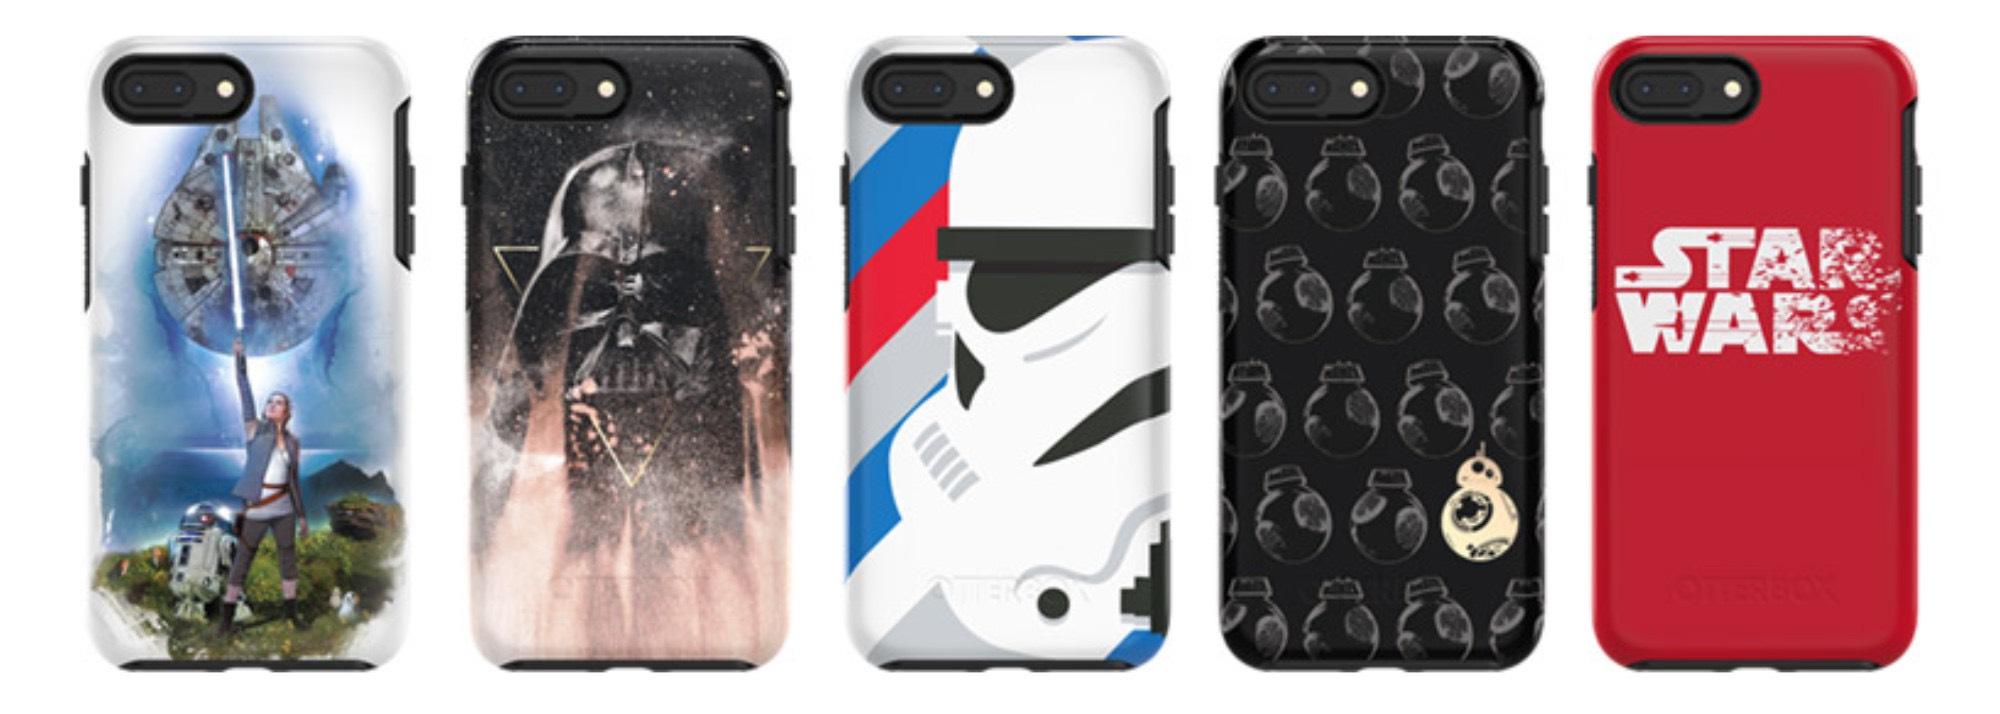 half off 0b8ff 97944 The best Star Wars gadgets for techies (not Trekkies)